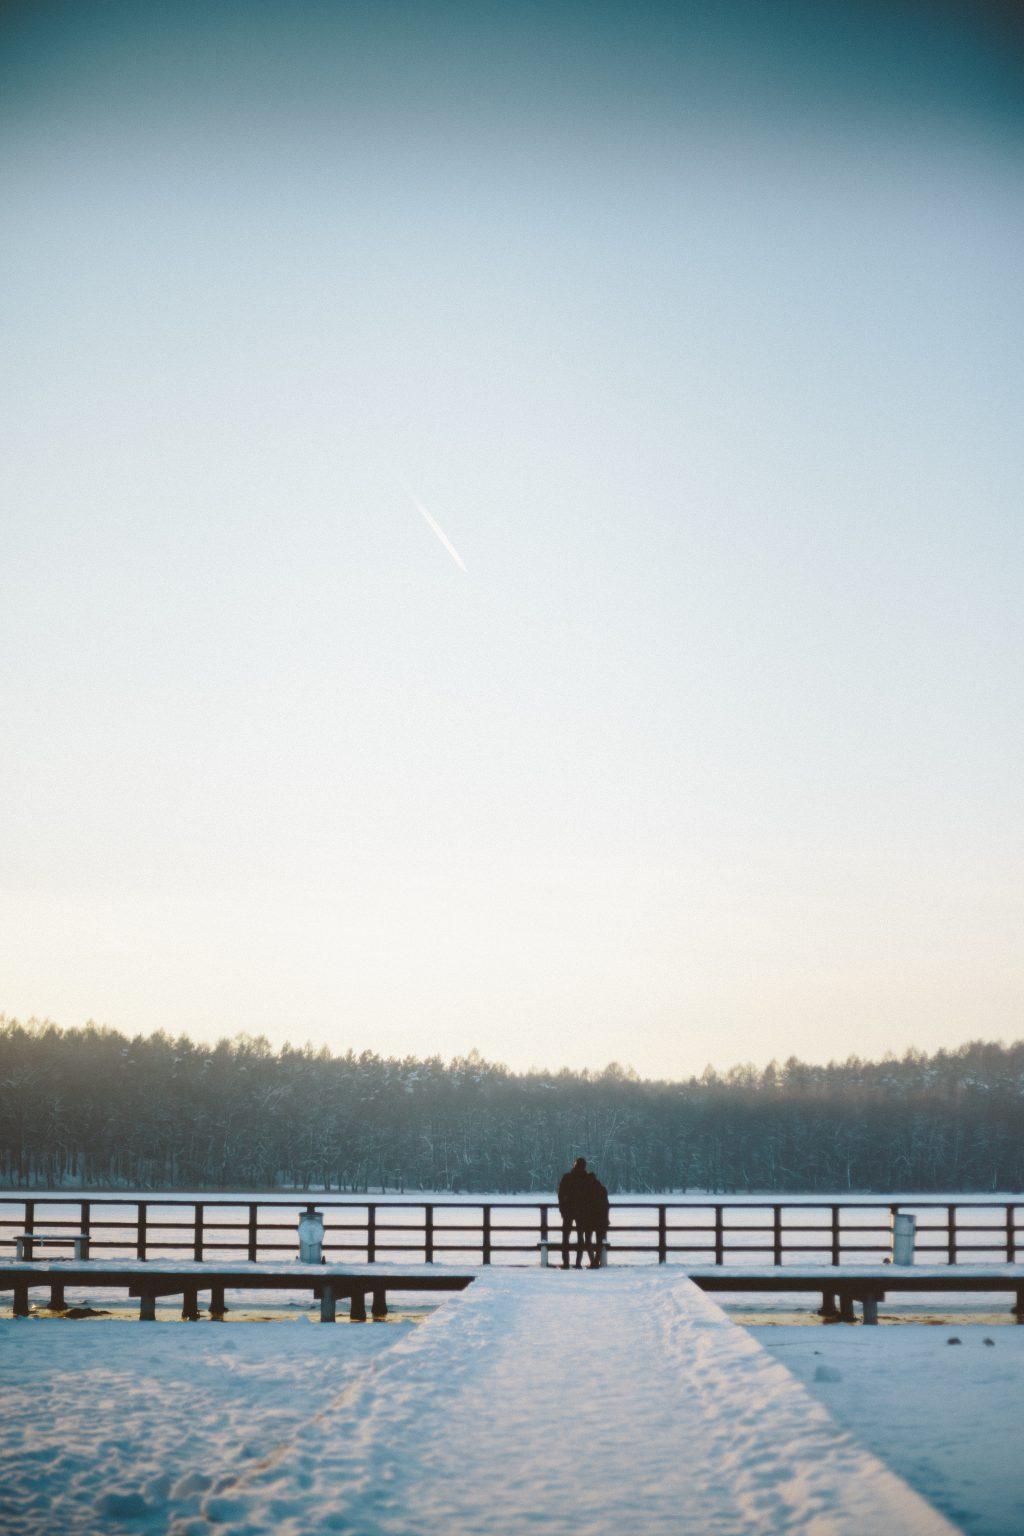 Couple on the bridge - free stock photo